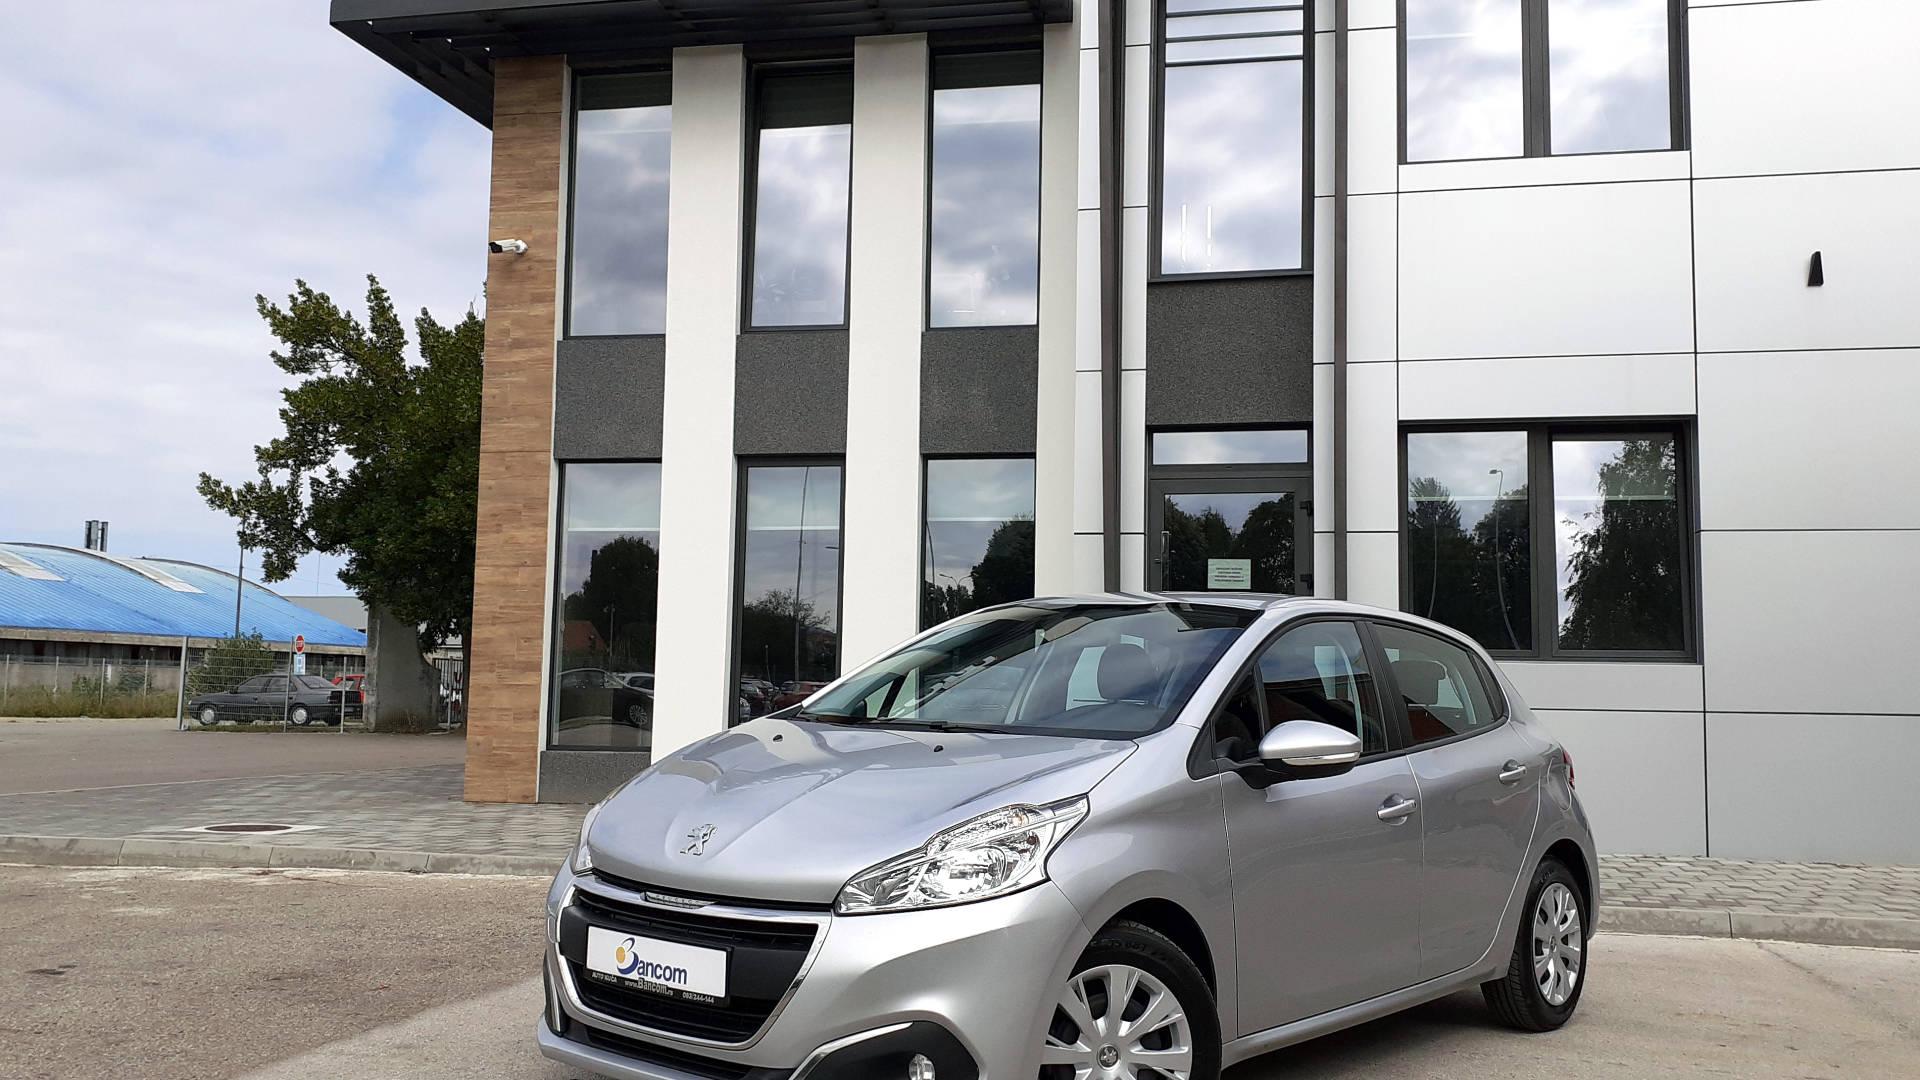 Fotografija za 2085 Peugeot 208 1.6BlueHDI Premium Pack